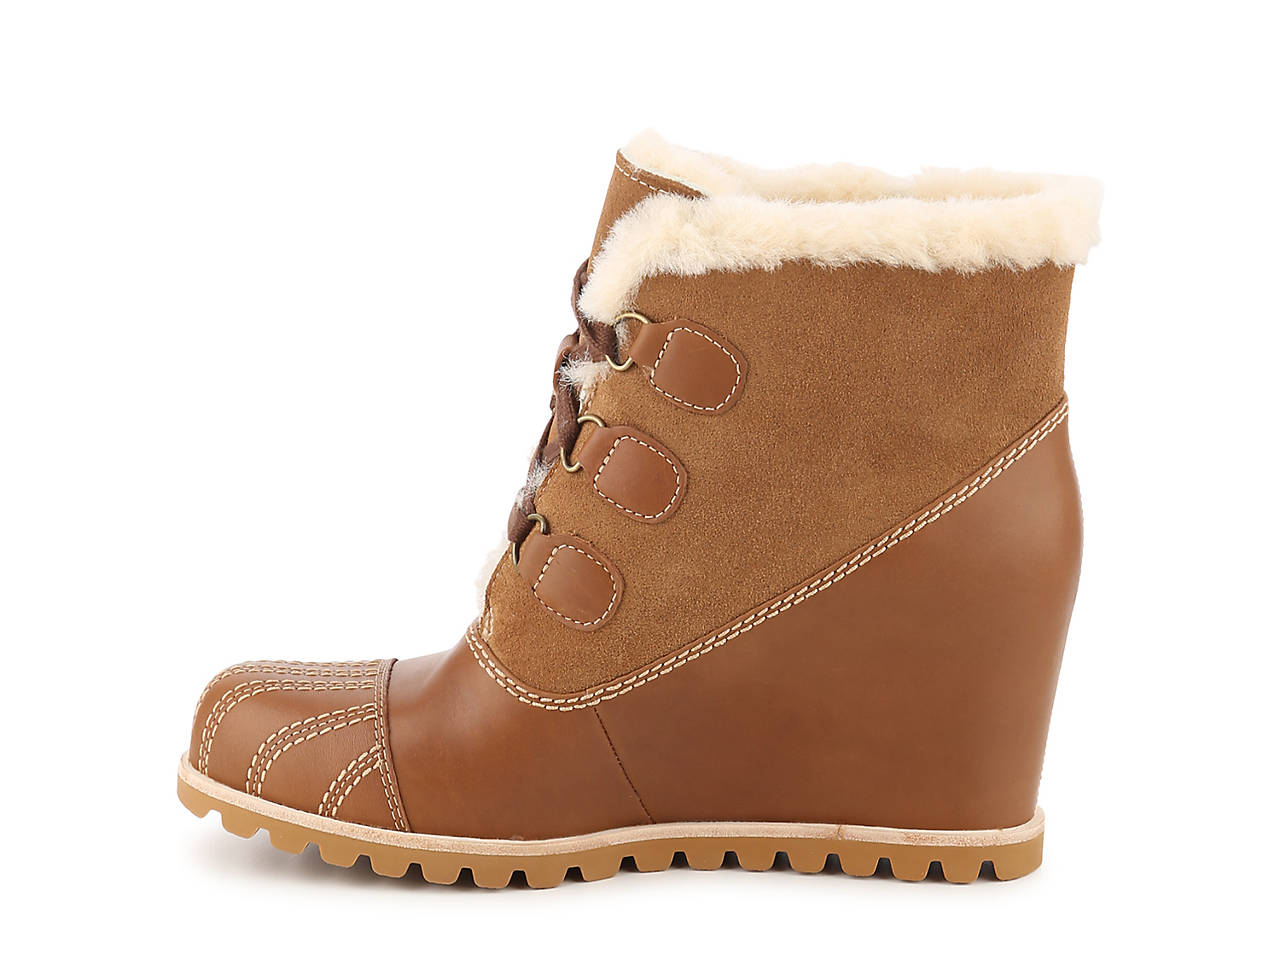 5b3f7022ad5 UGG Alasdair Wedge Bootie Men s Shoes